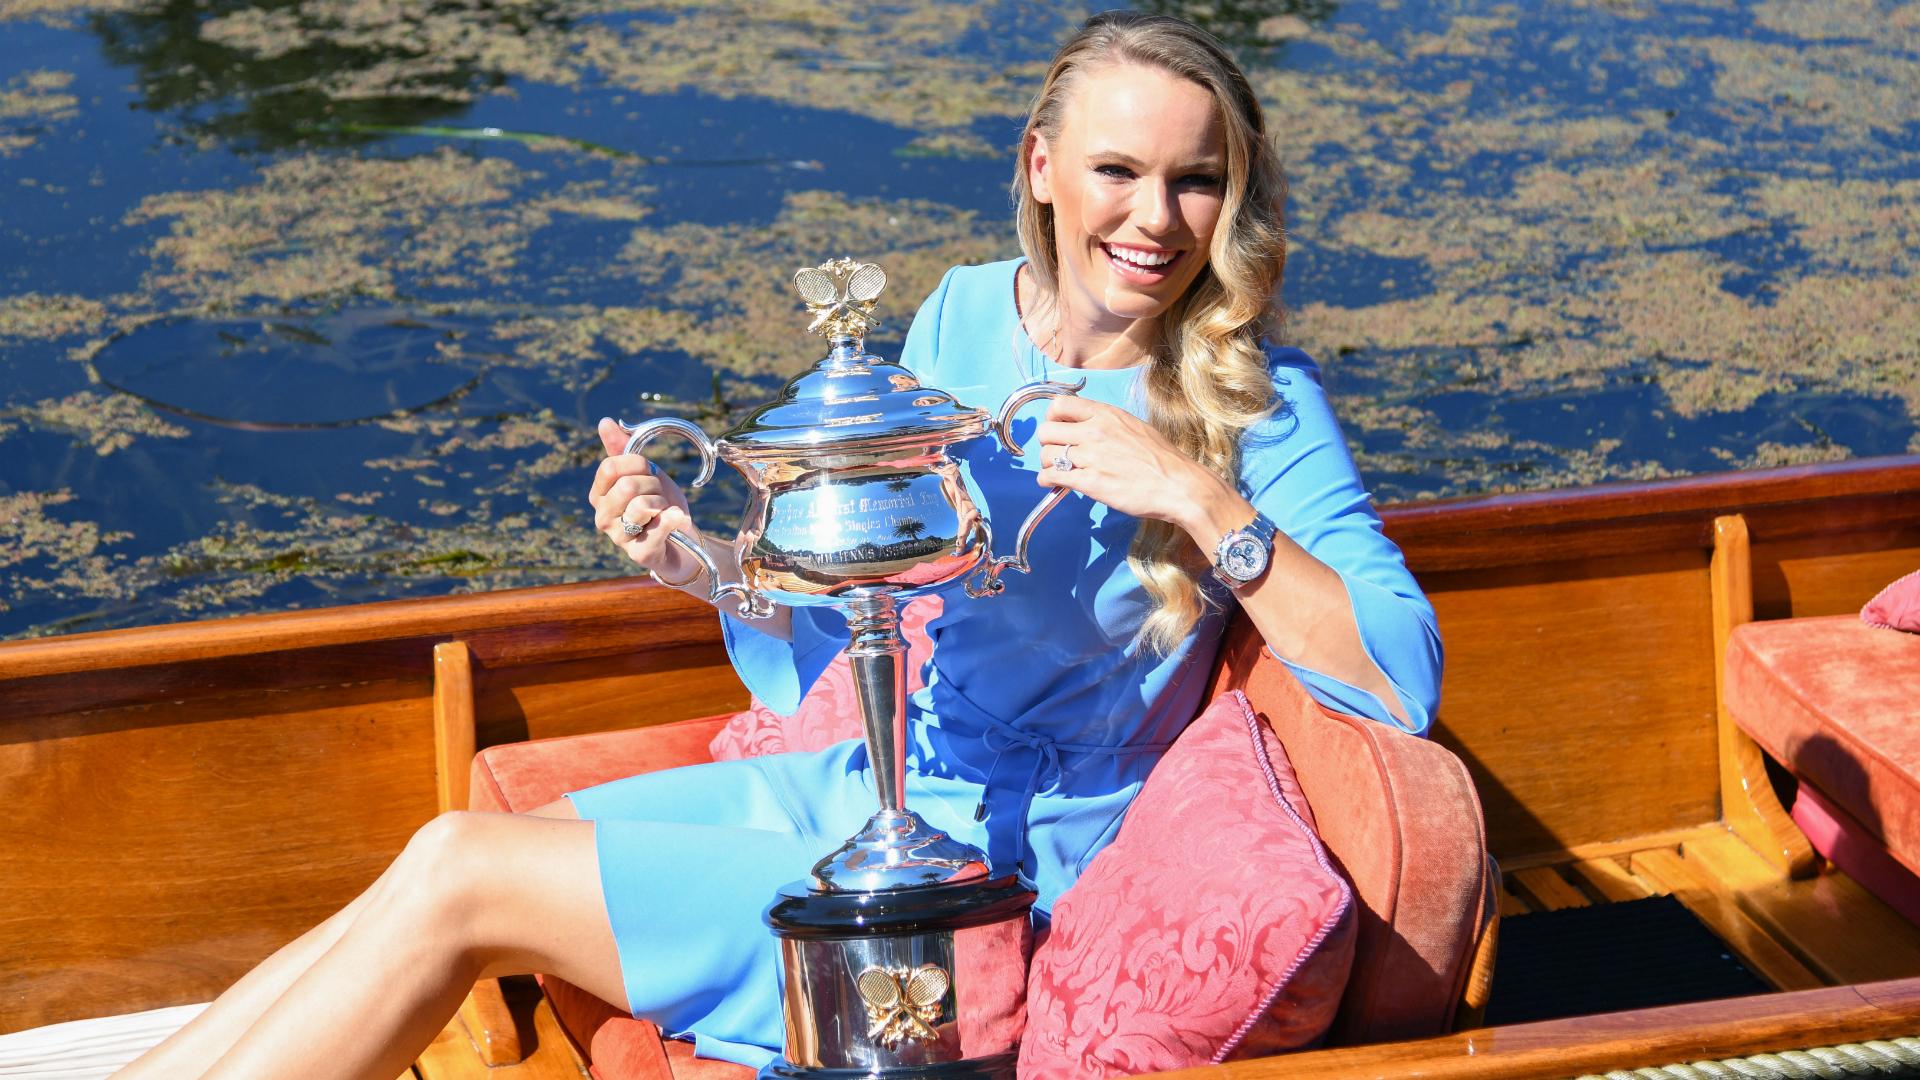 Australian Open 2018 Women's Final: Simona Halep vs. Caroline Wozniacki Preview